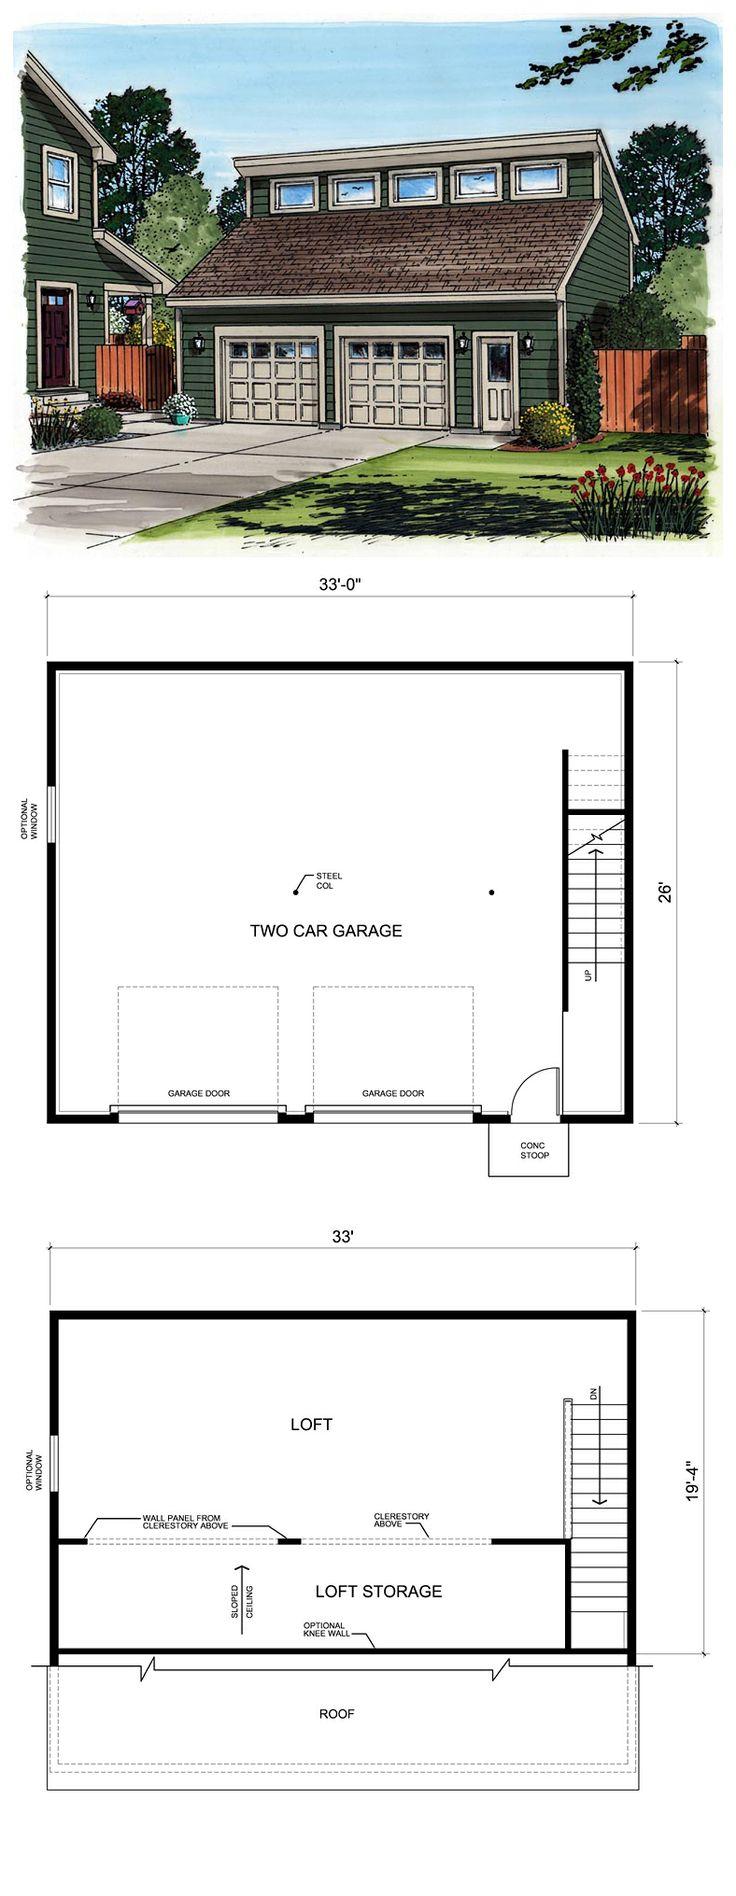 27 best two car garage plans images on pinterest garage plans contemporary garage plan 30011 garage planscar